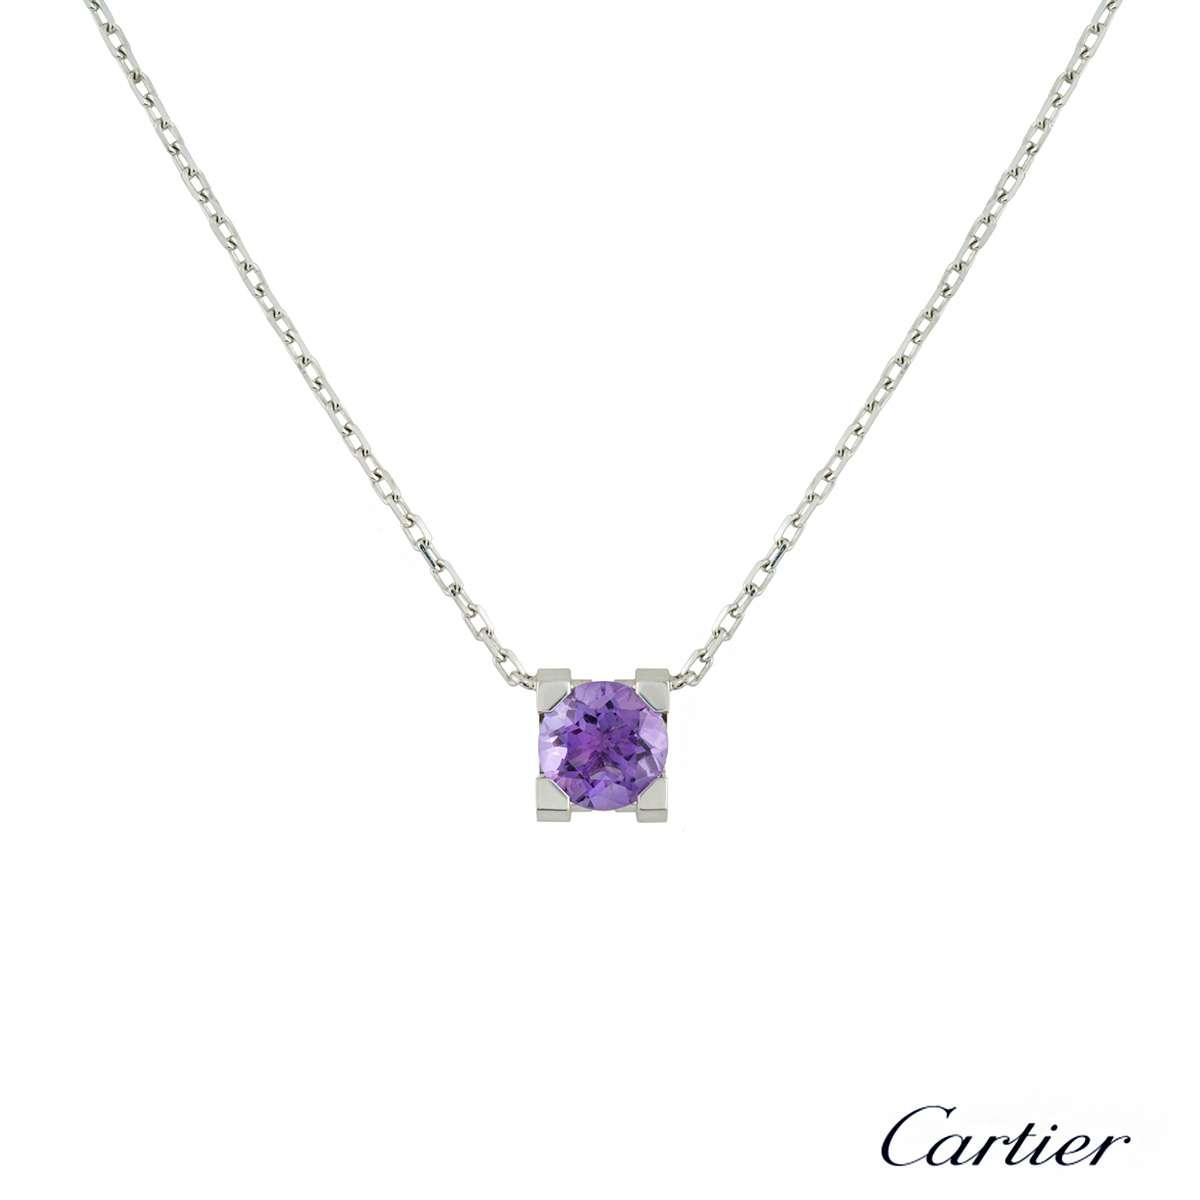 C de Cartier Amethyst Pendant